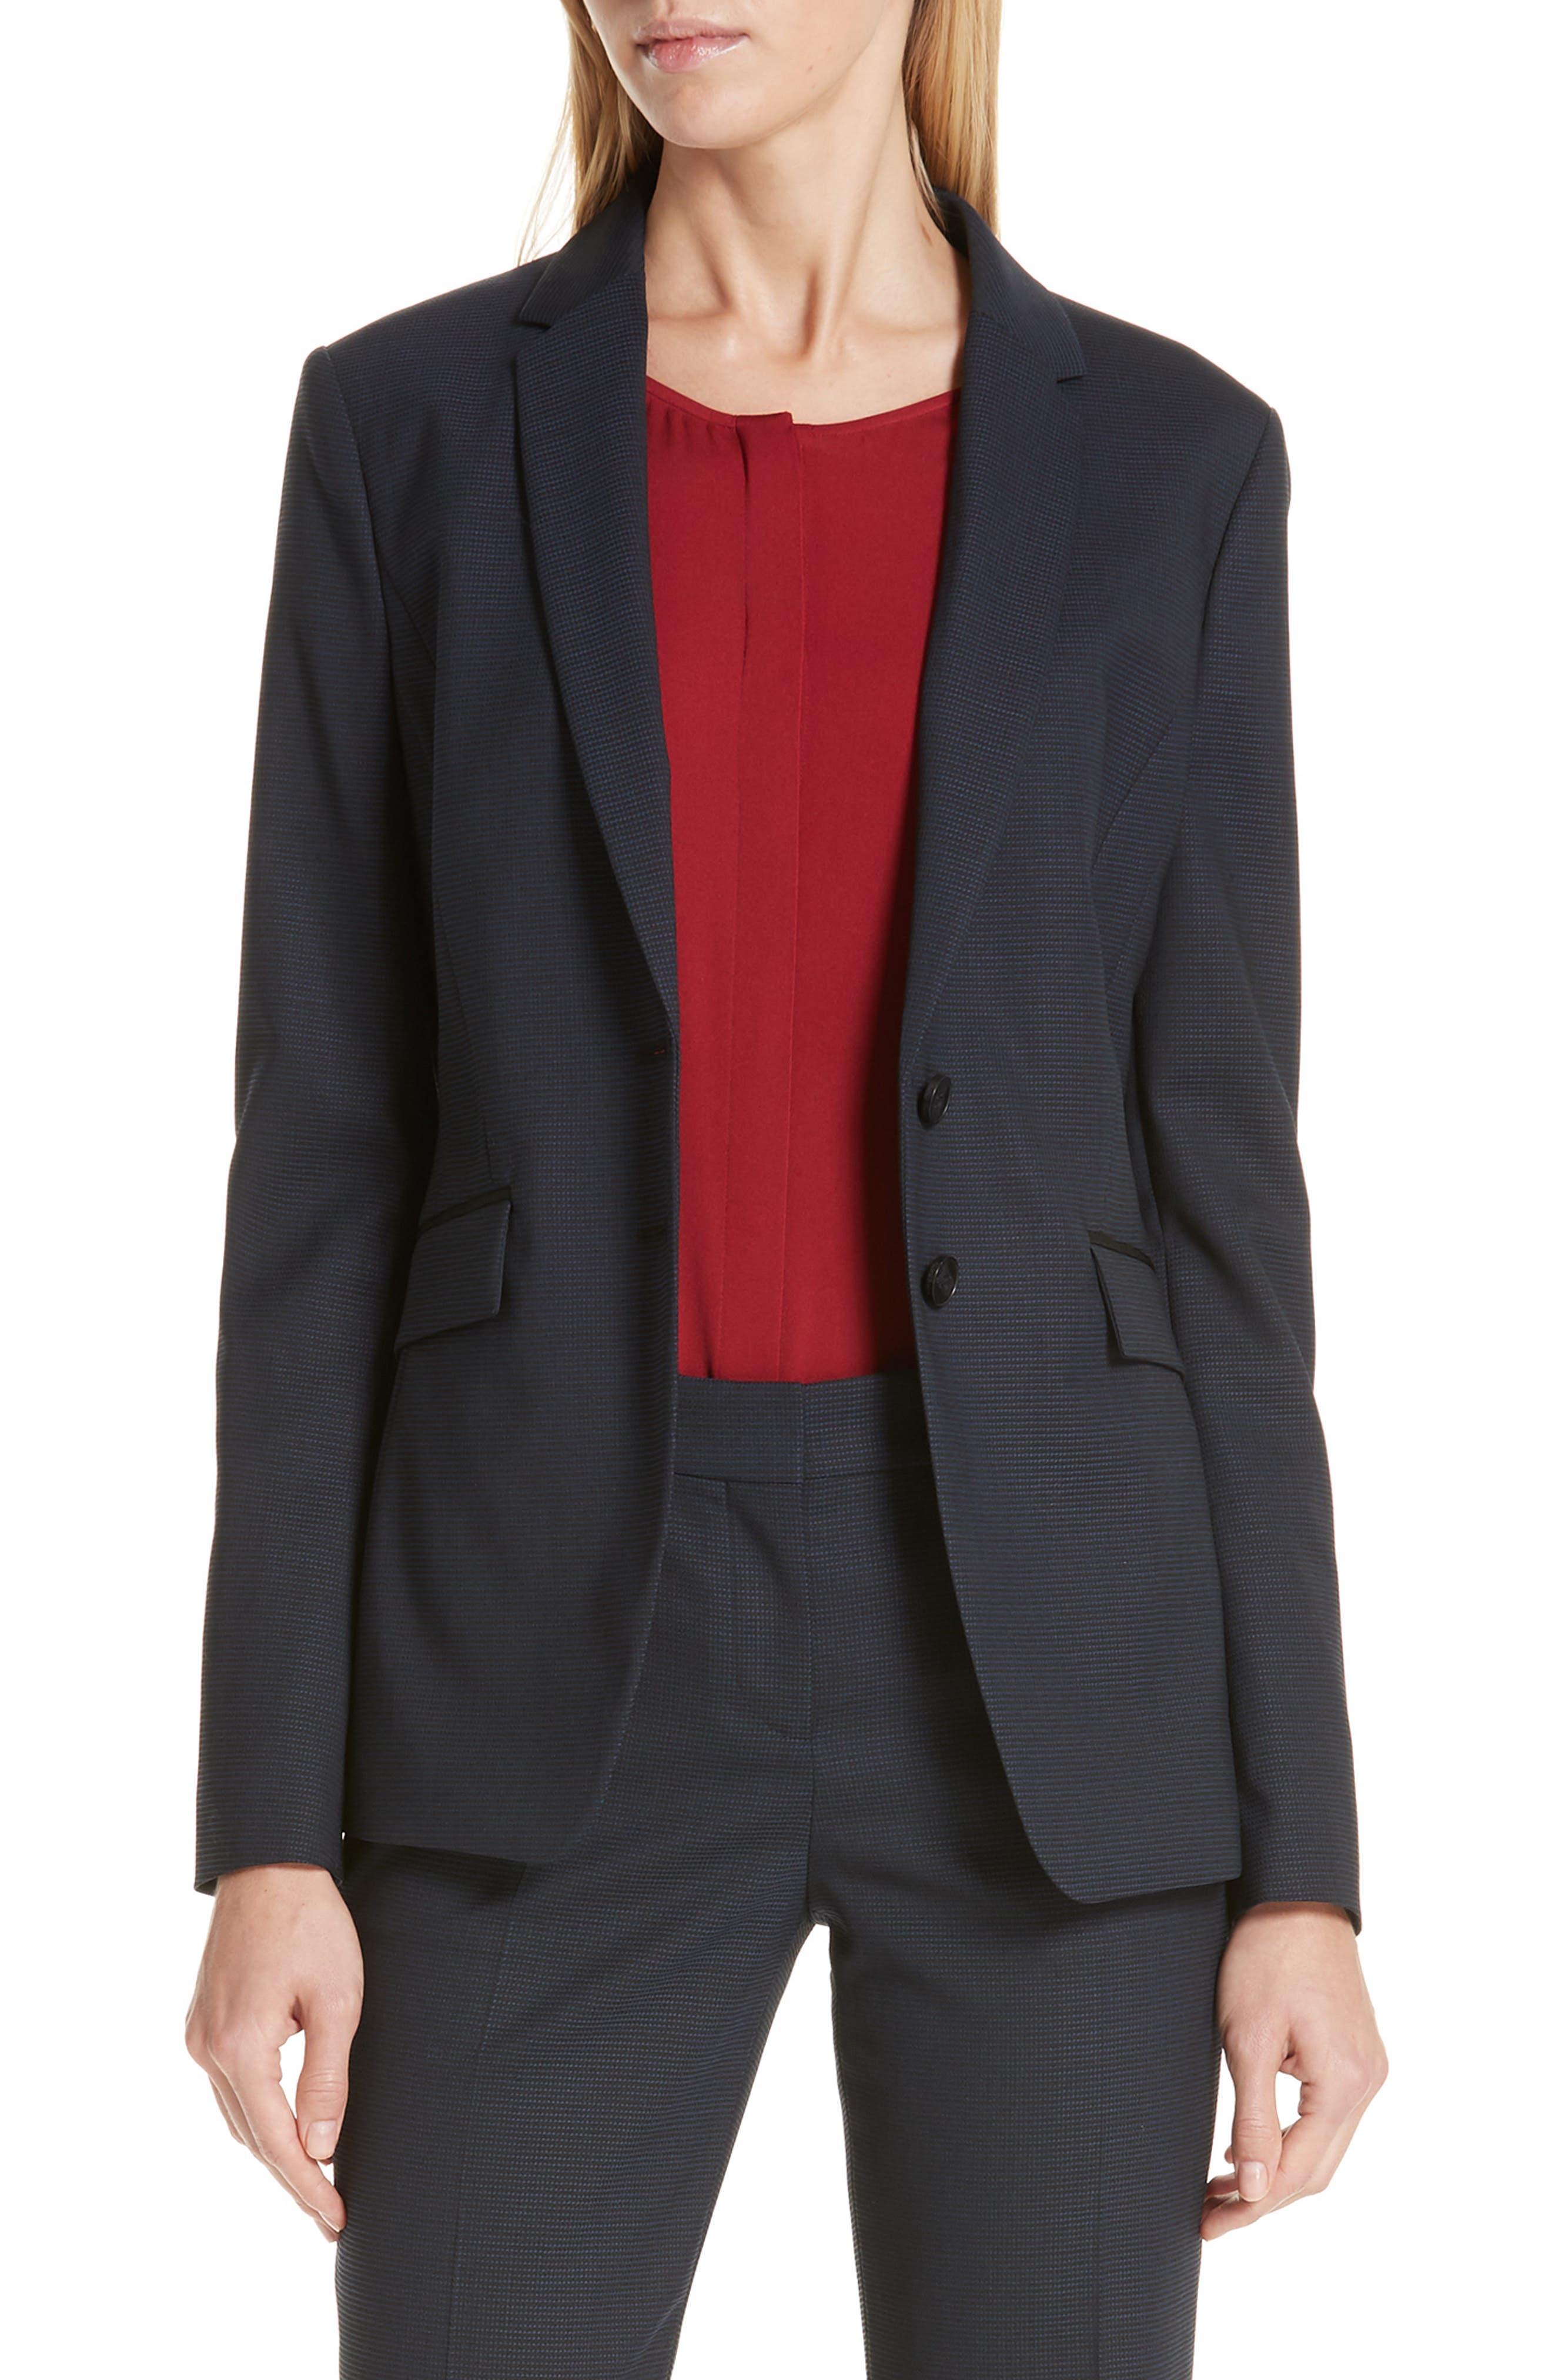 BOSS Jabahana Tonal Minidessin 2B Virgin Wool Suiting Jacket in Dark Navy Fantasy